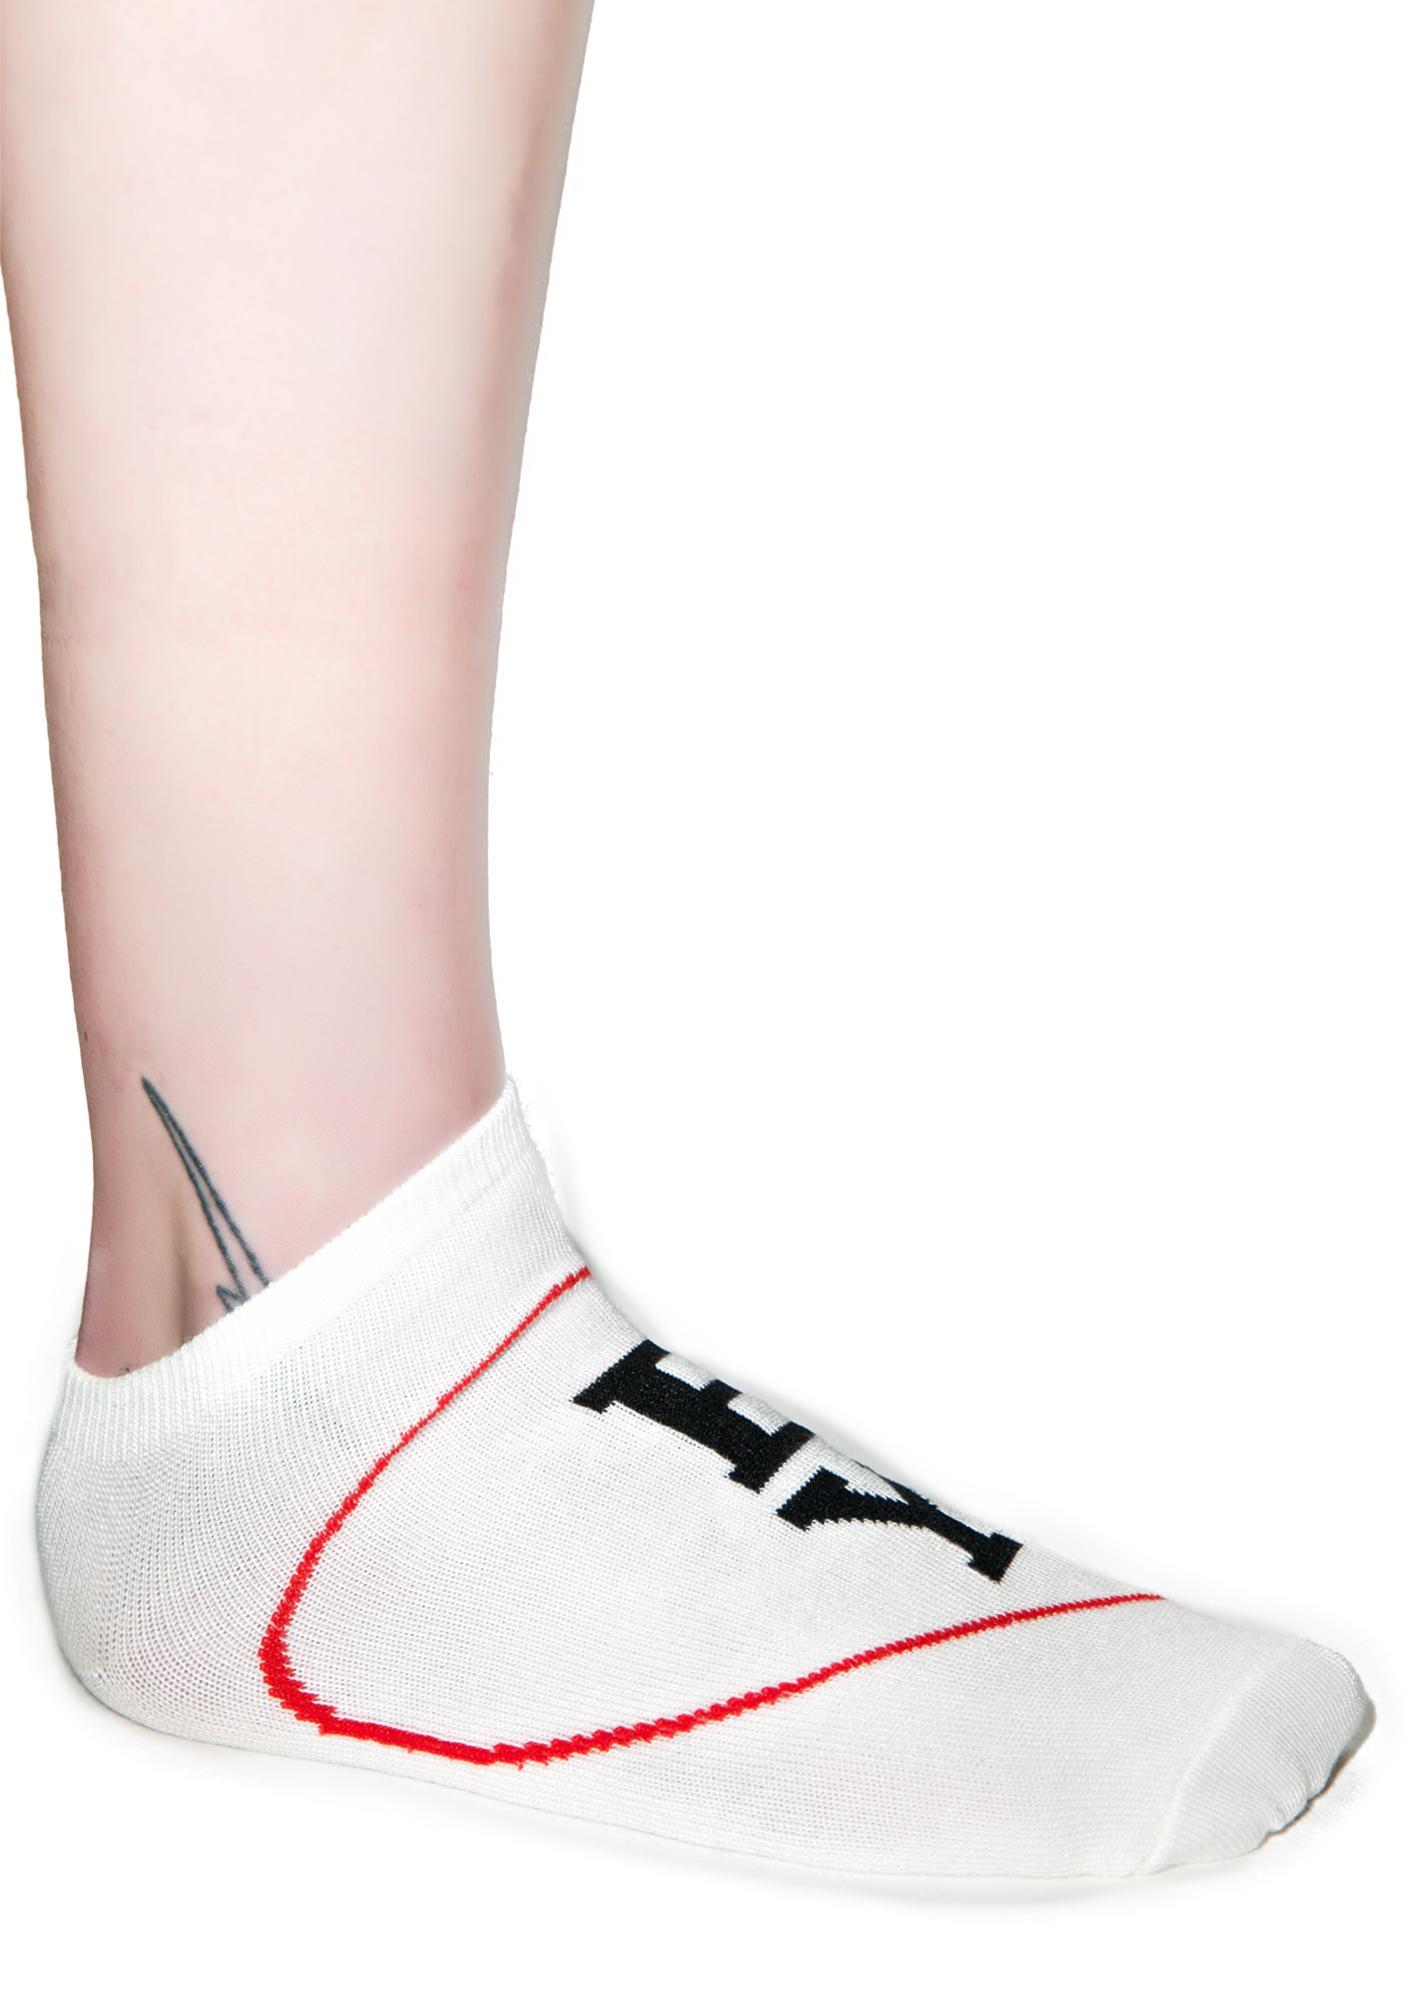 Boy Crazy Ankle Socks